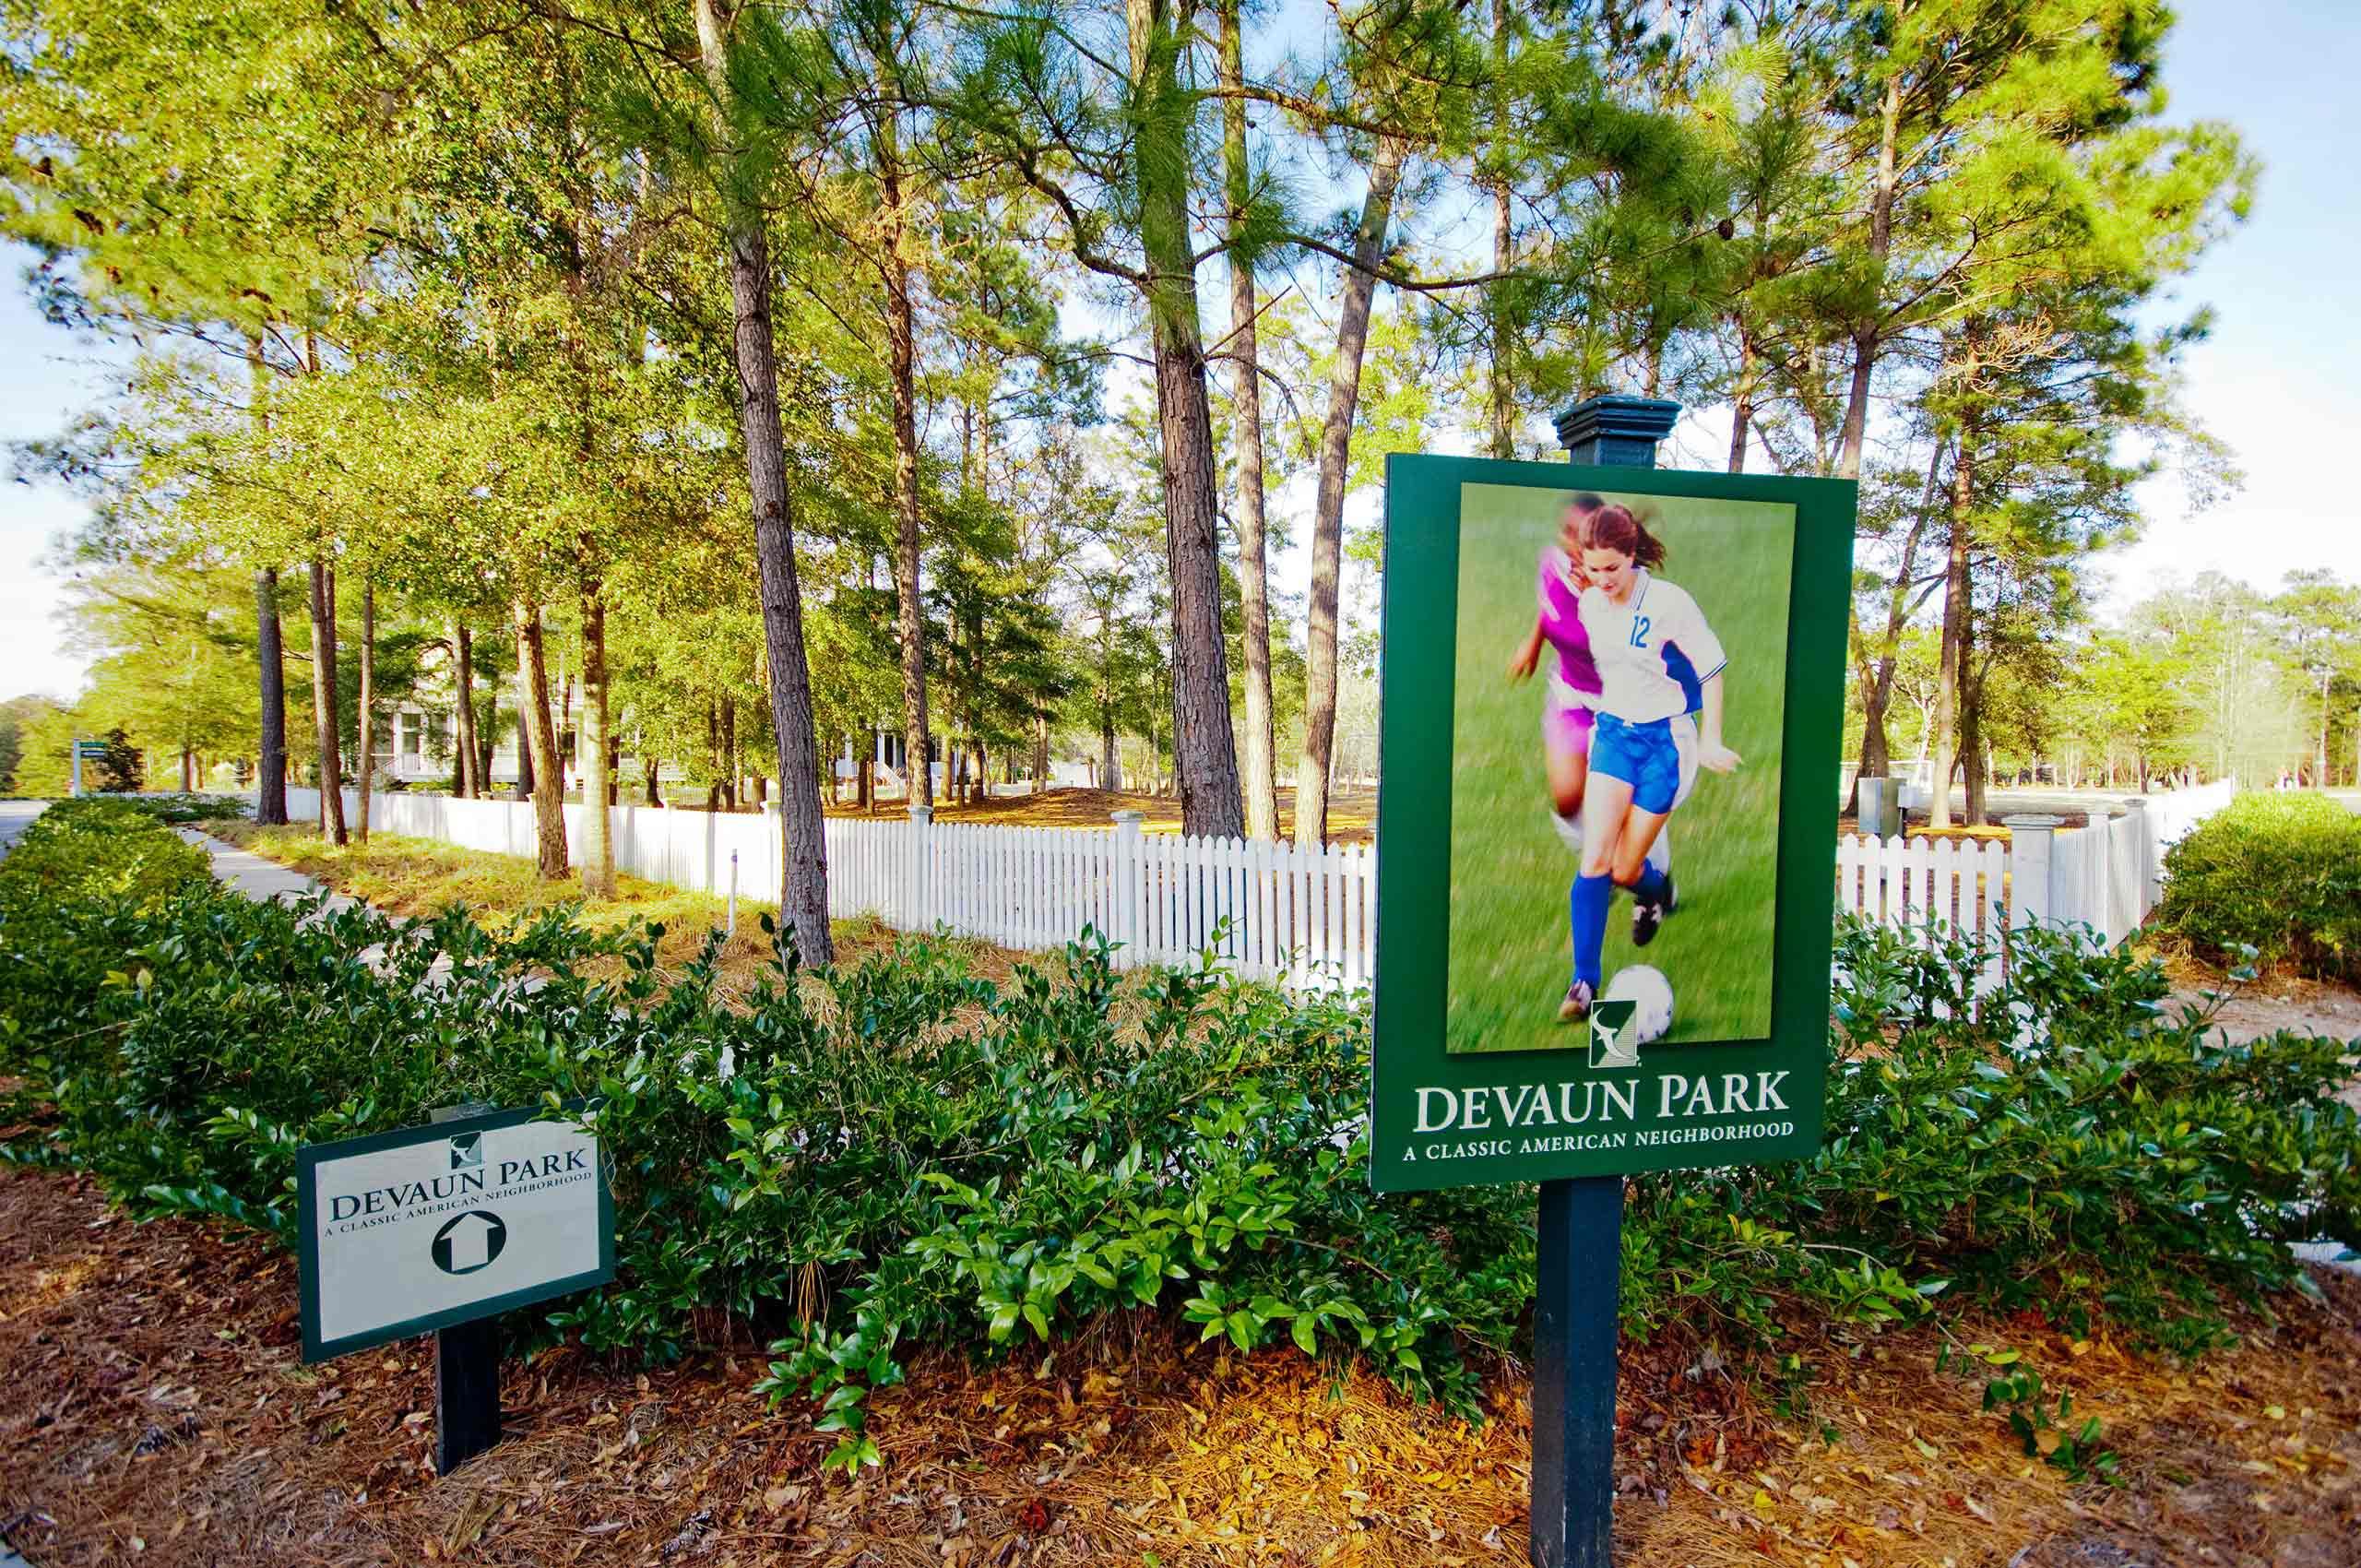 Devaun Park Real Estate Presented By Silver Coast Properties